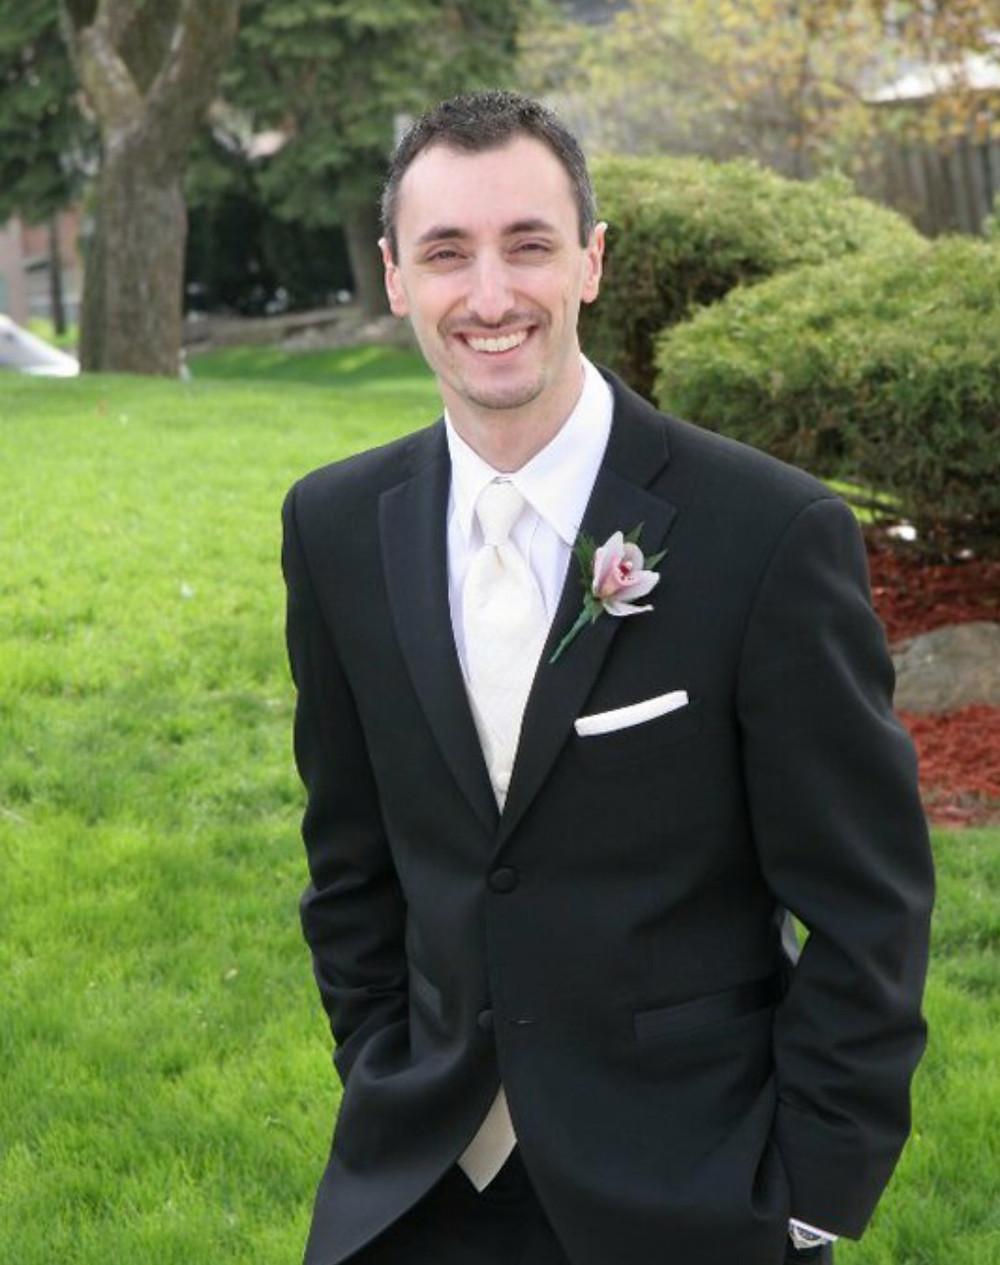 Mark Daher in a suit